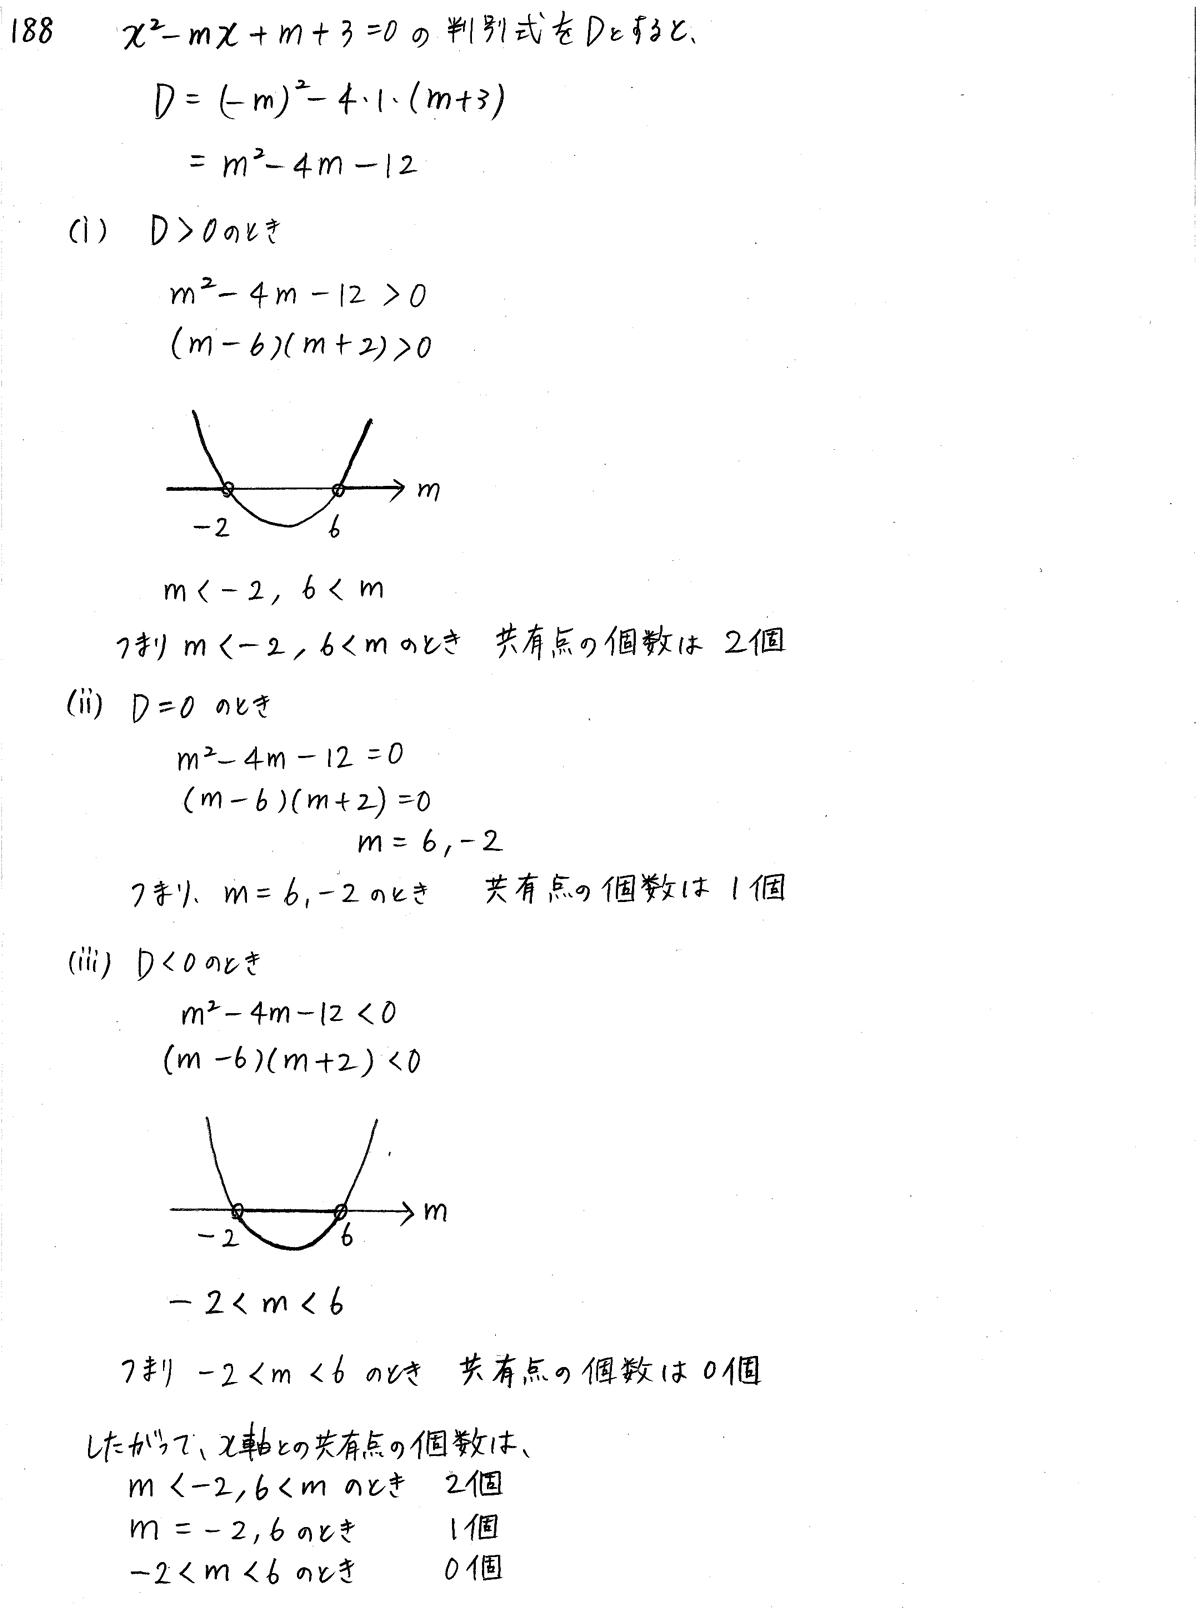 3TRIAL数学1-188解答